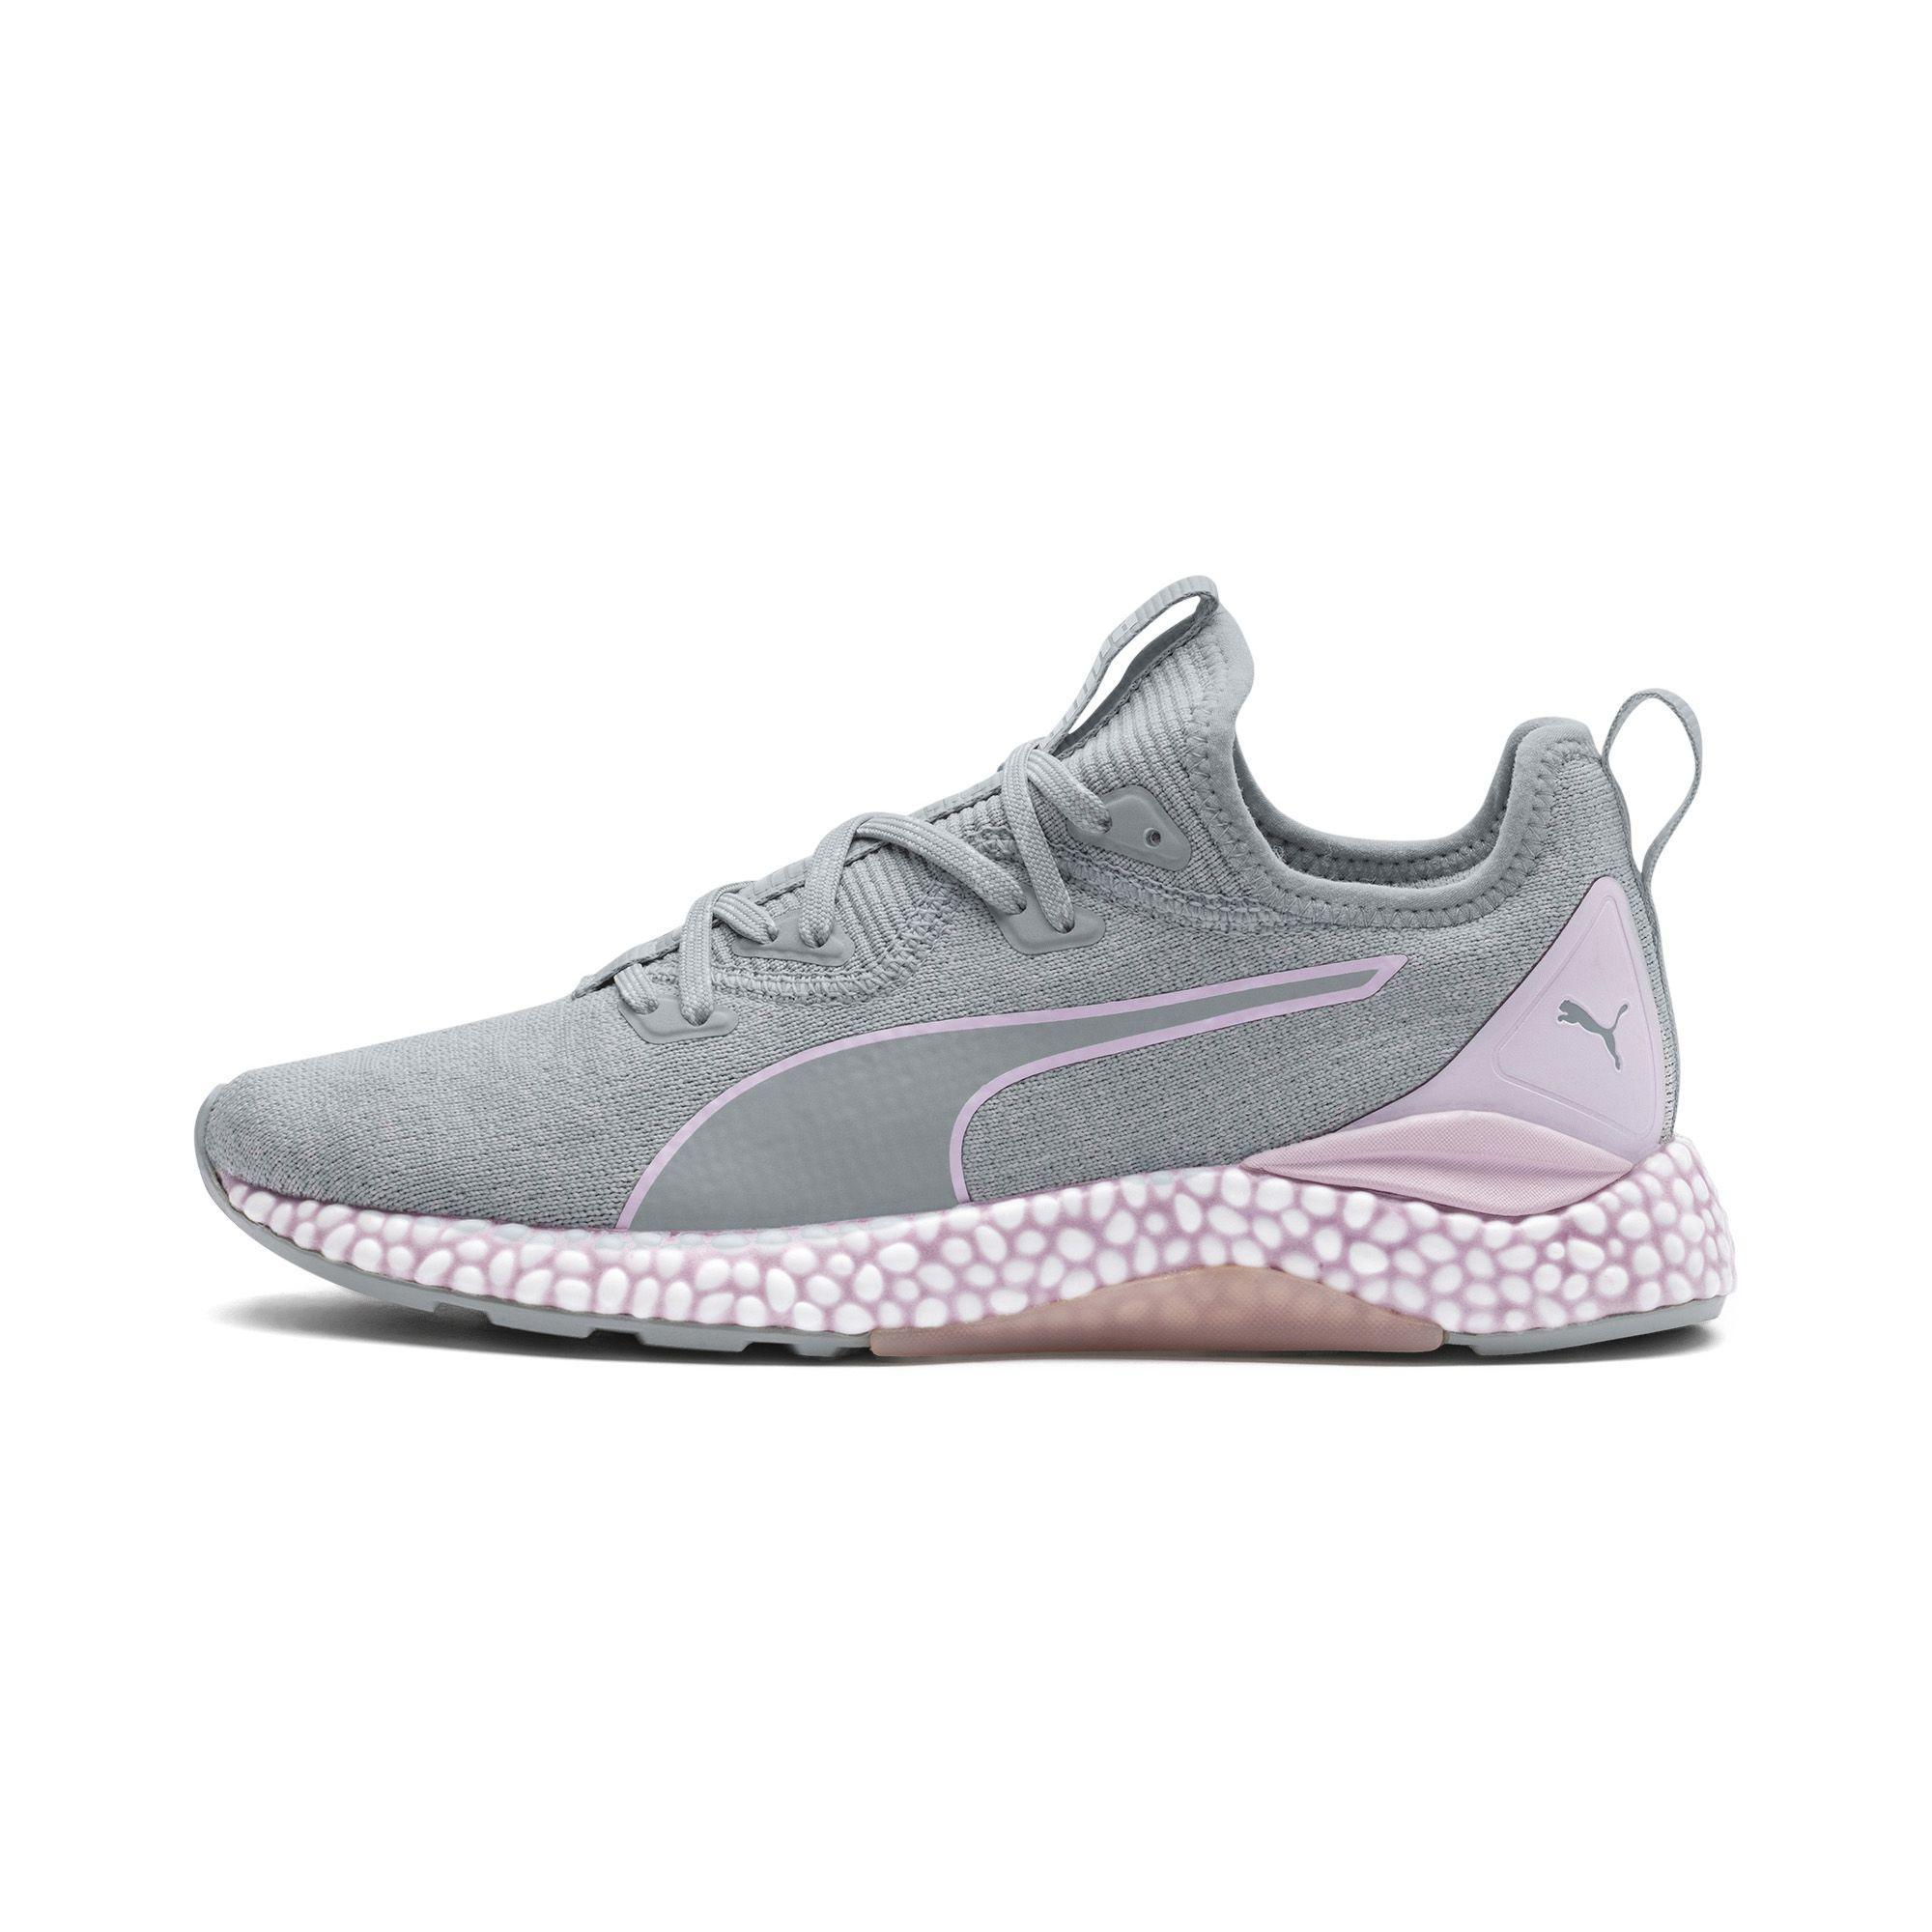 Puma Chaussures Hybrid Runner Femmes